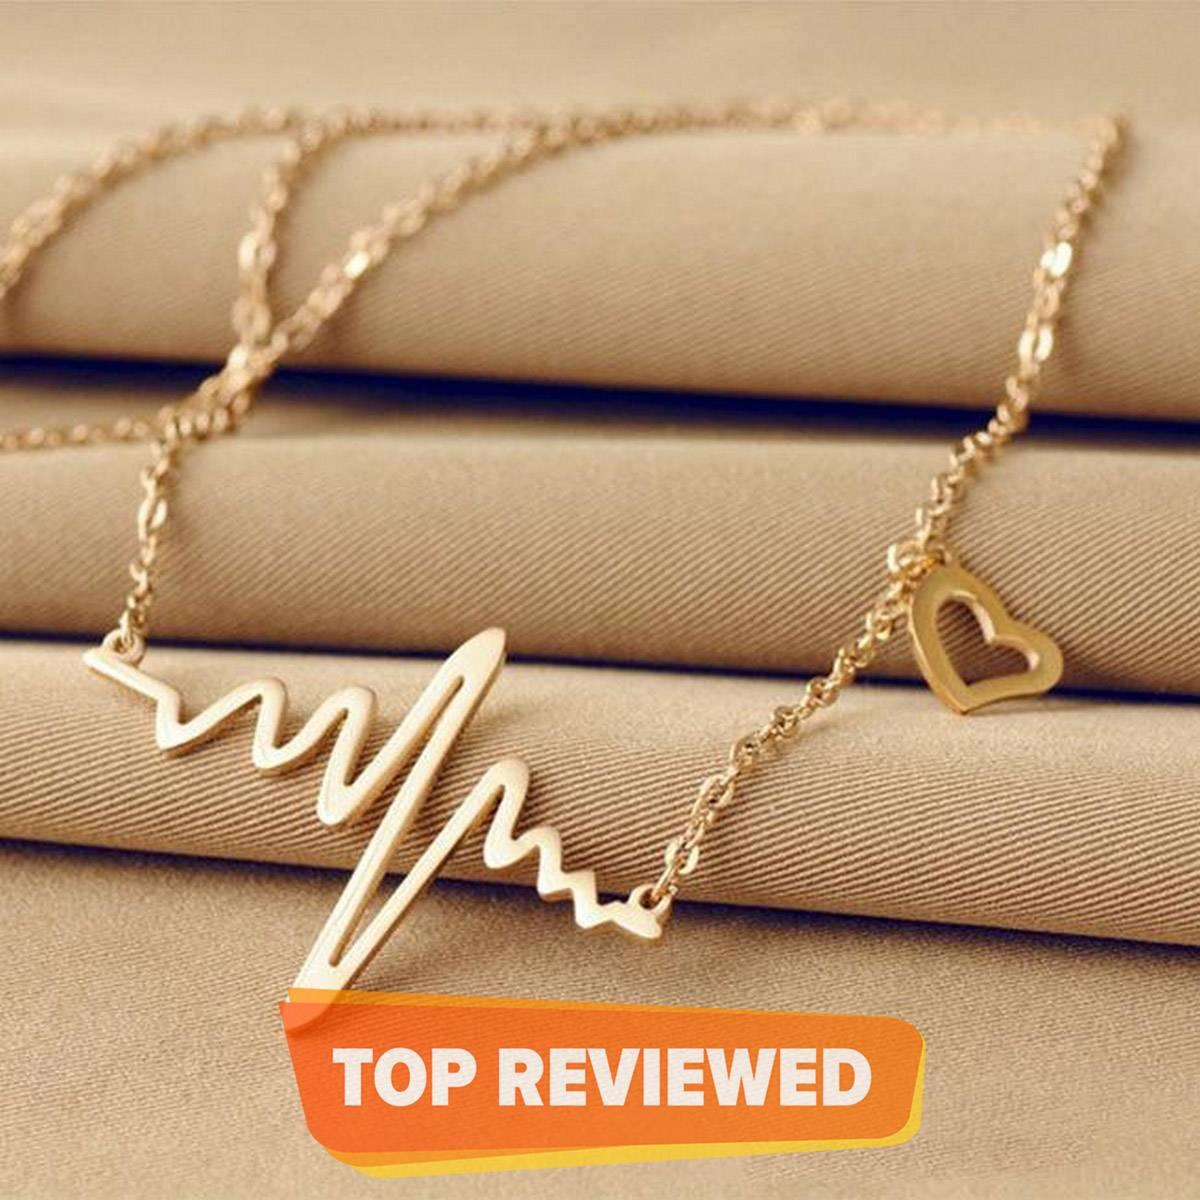 ECG Pendant Necklace For Women - New Arrivals